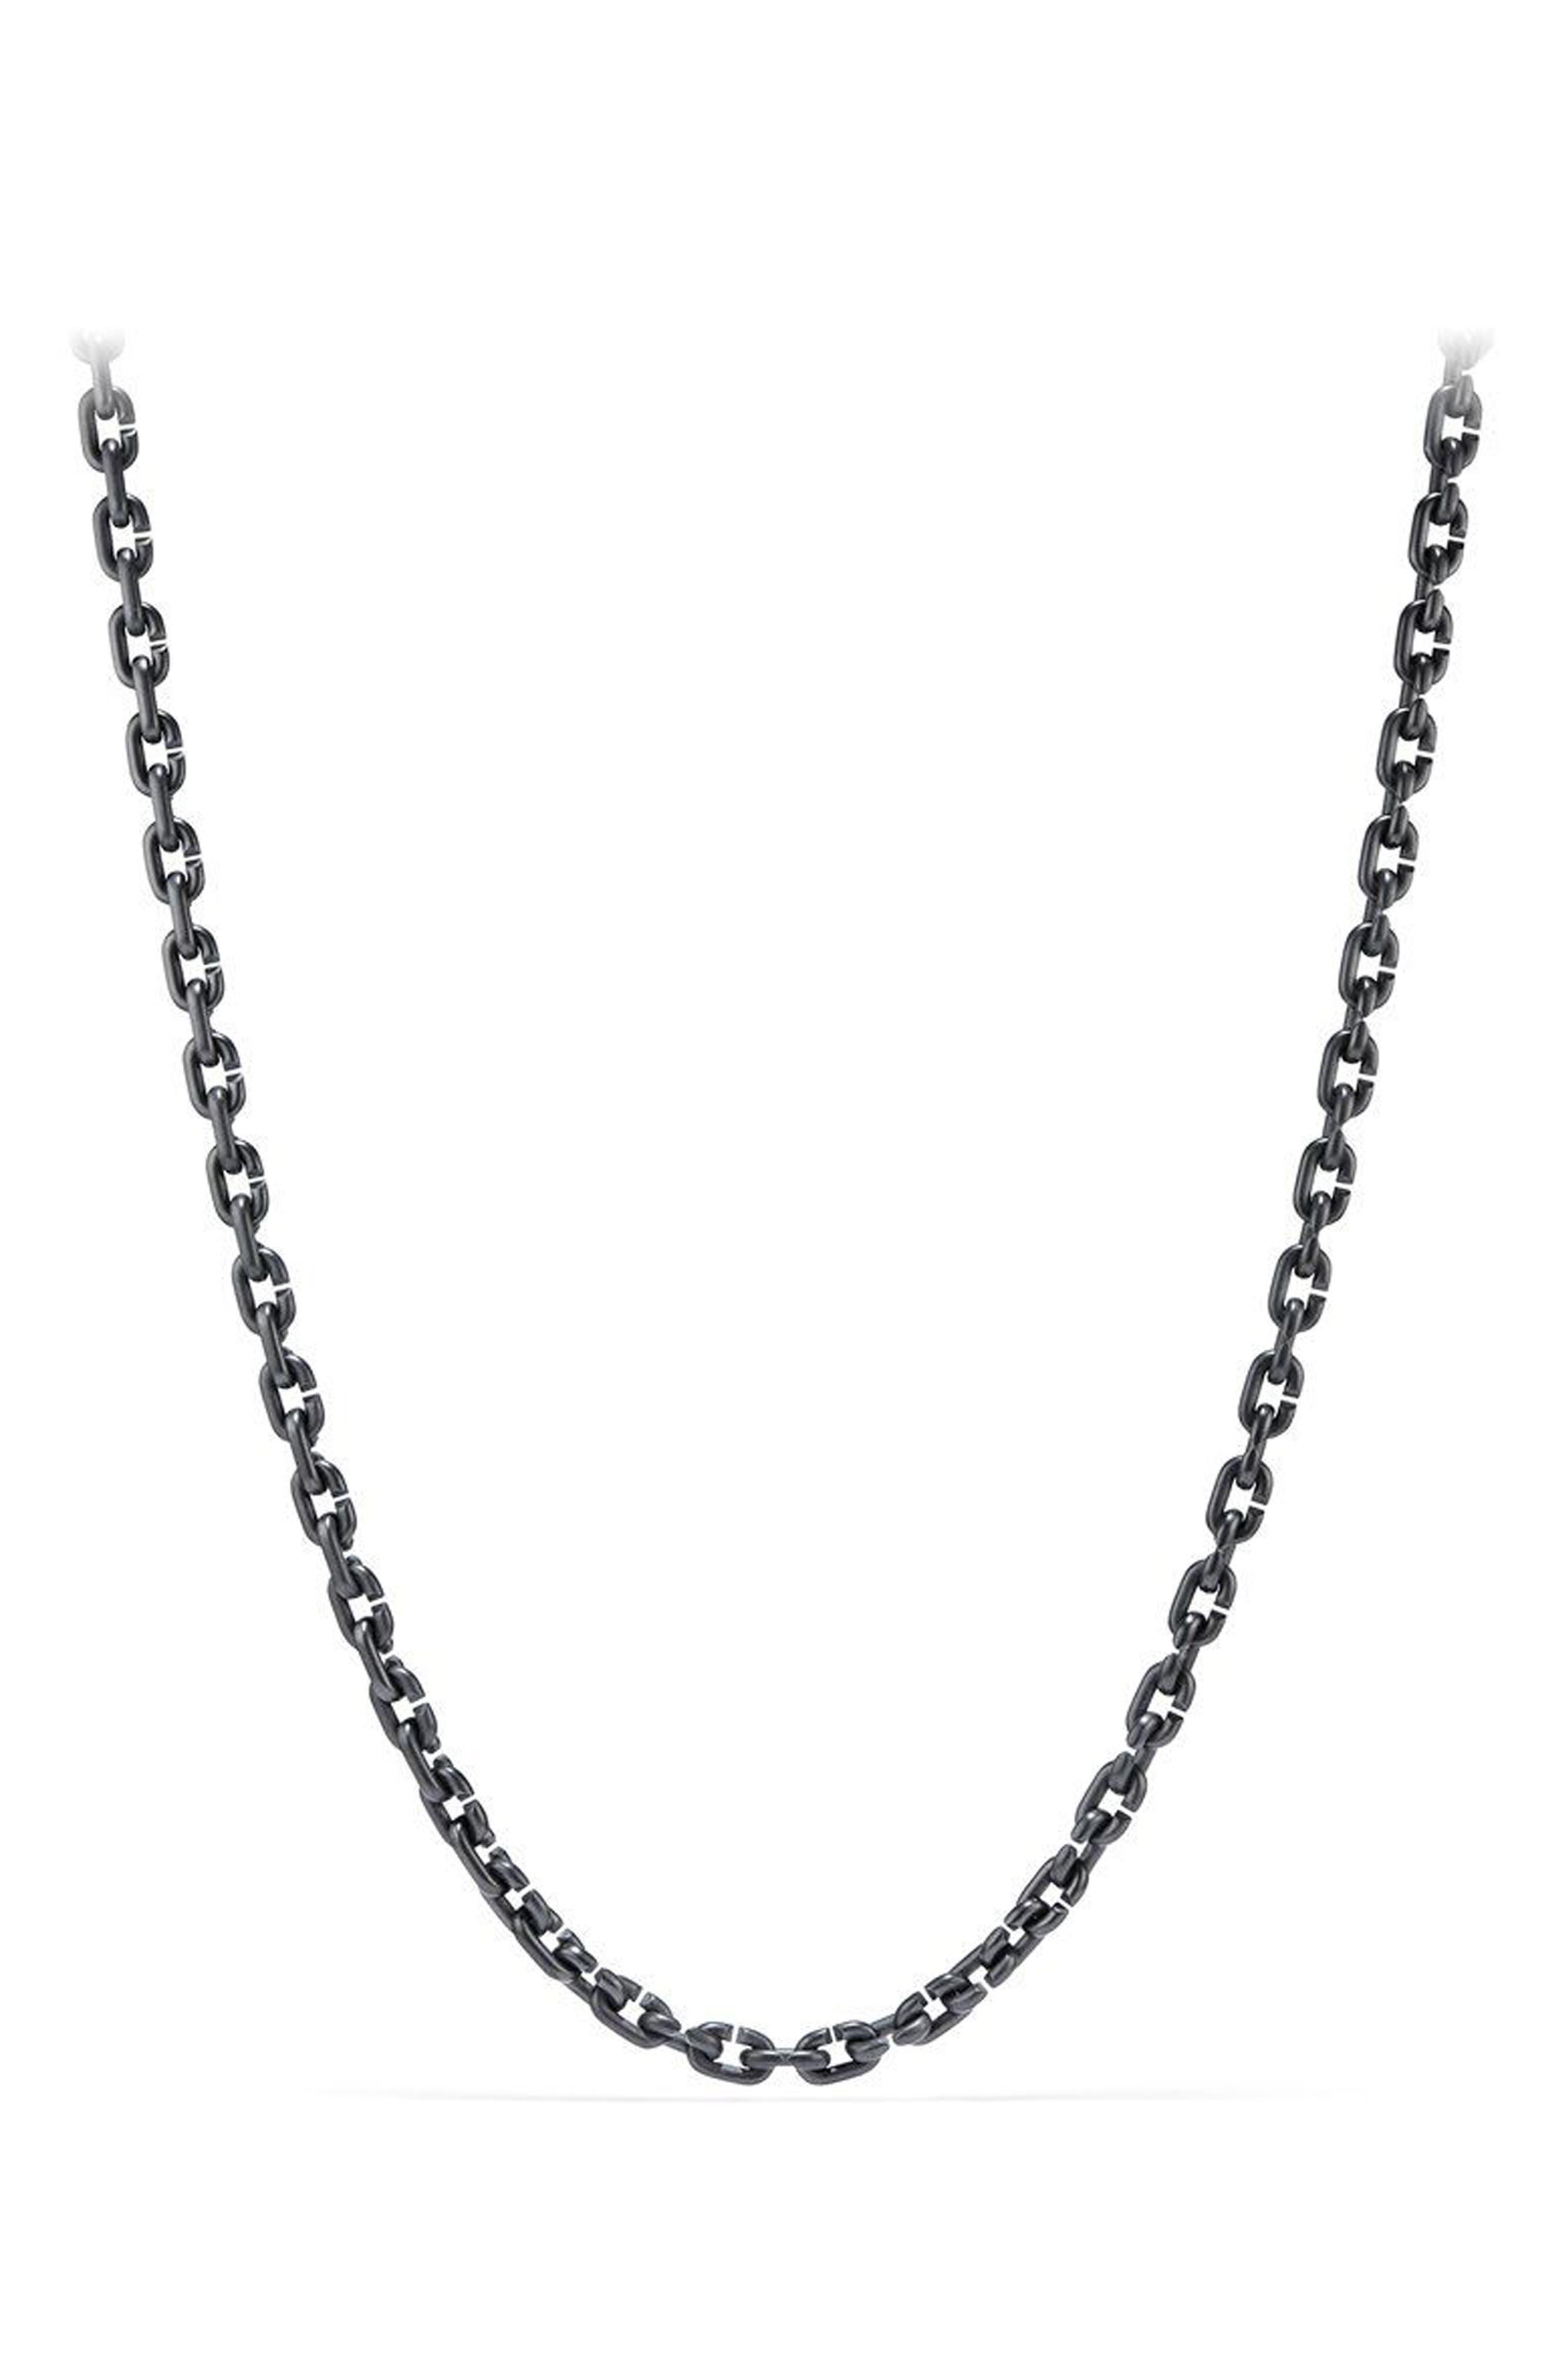 Narrow Chain Link Necklace,                             Main thumbnail 1, color,                             TITANIUM